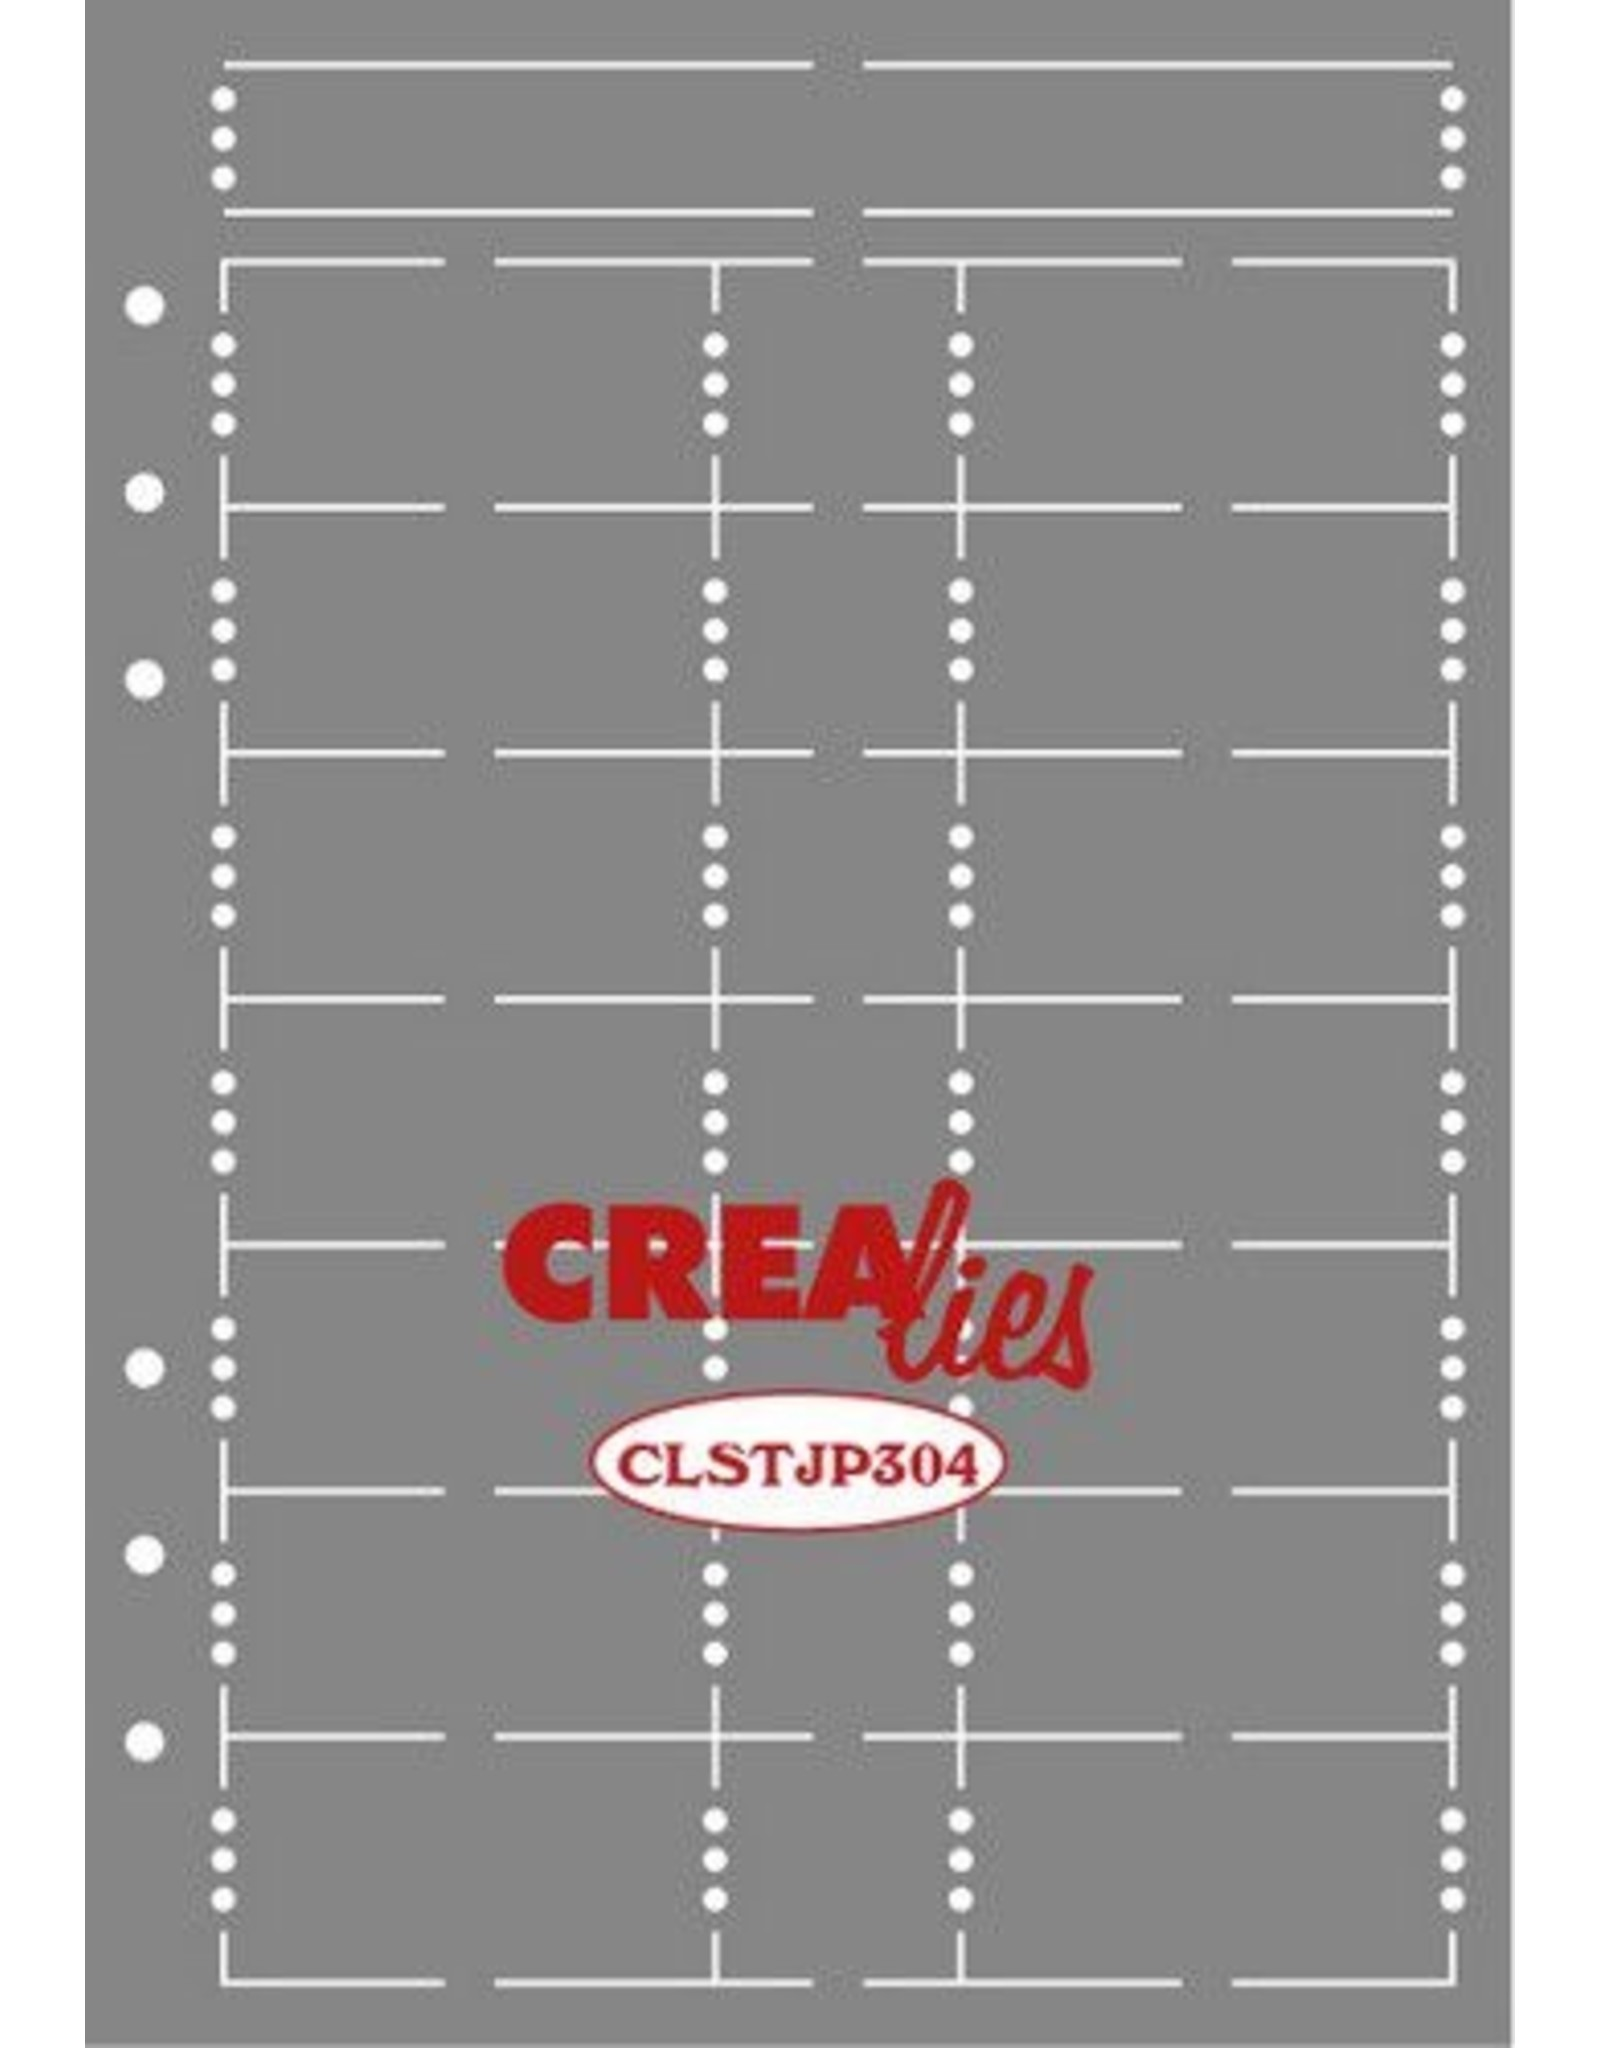 Crealies Crealies Journalzz & Pl Stencil Journaling Week Pagina B CLSTJP304 14,5 x 20,8 cm